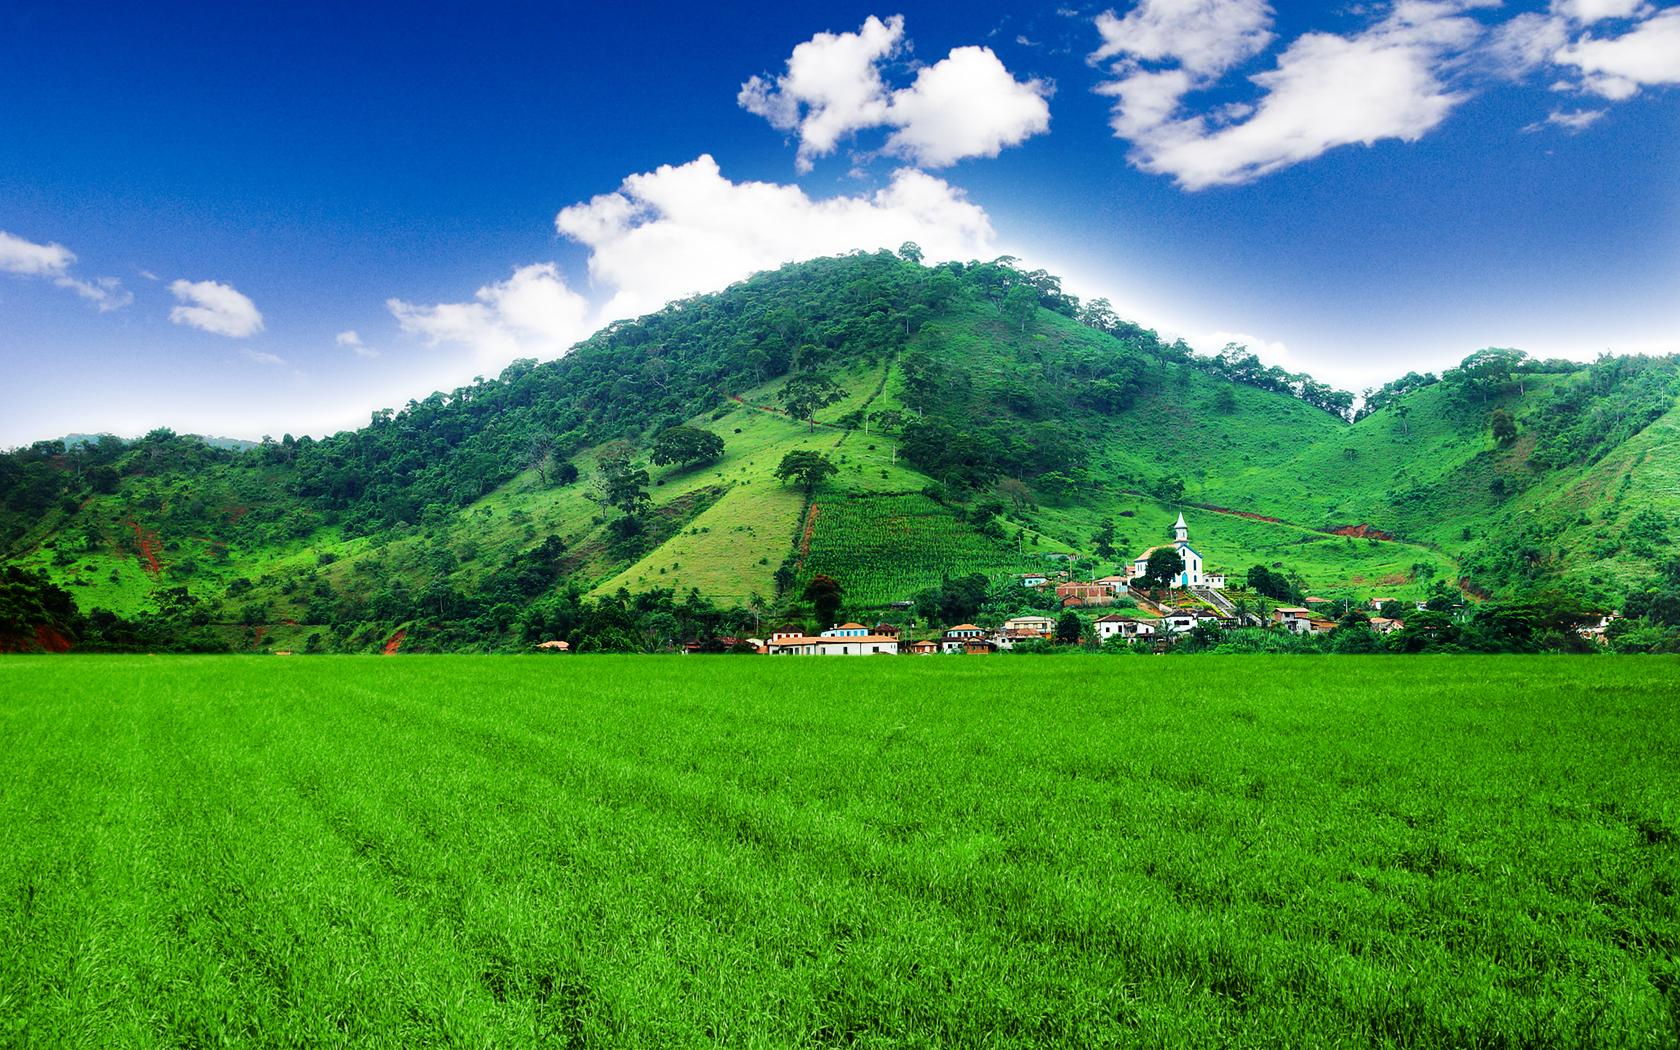 mountain and the greenary - photo #32